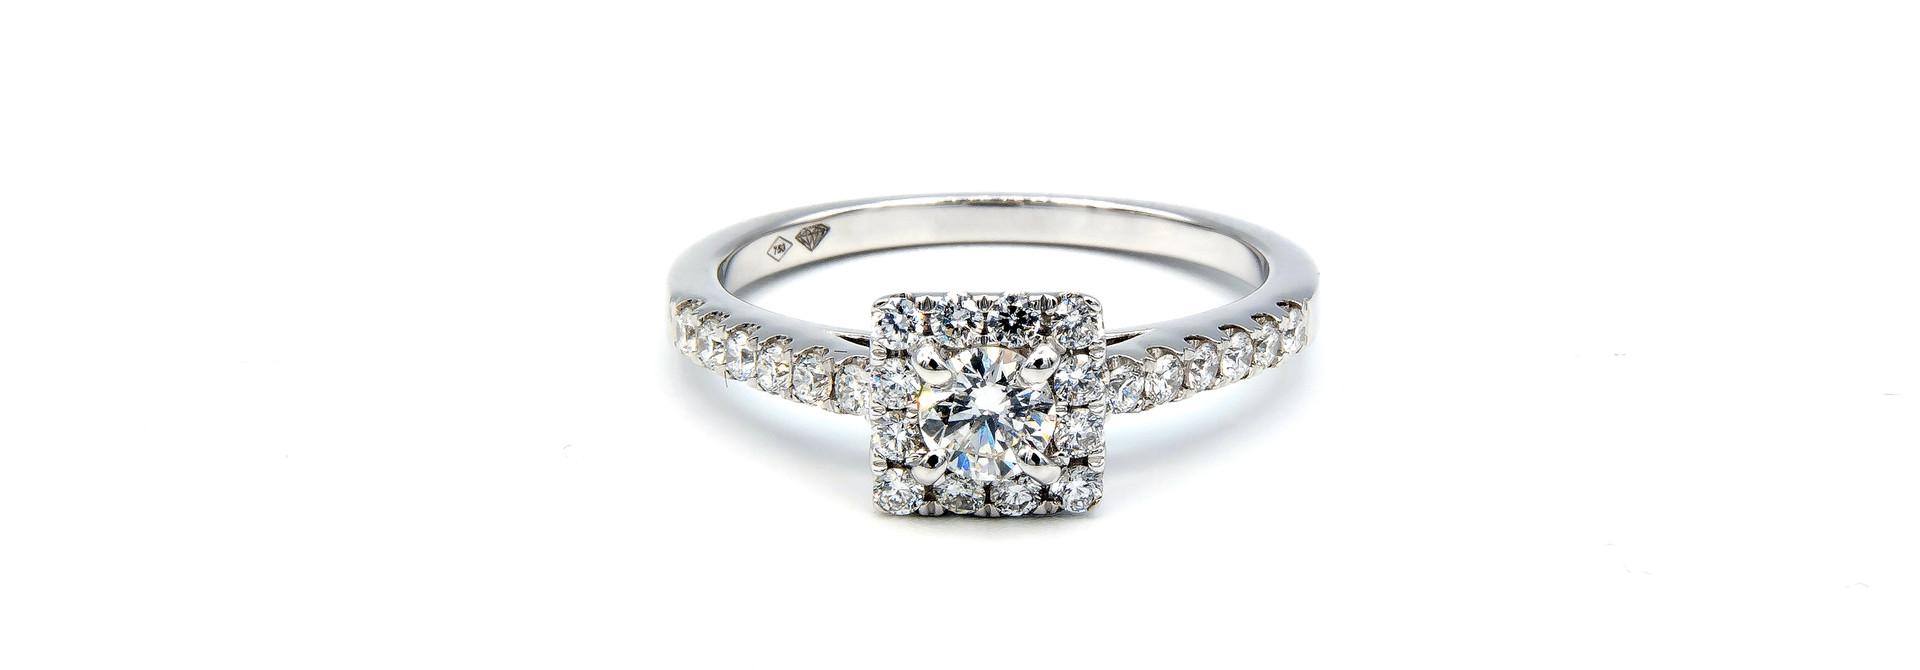 Ring verlovingsring witgoud met 0,2 ct SI en 0,28 ct VS diamant